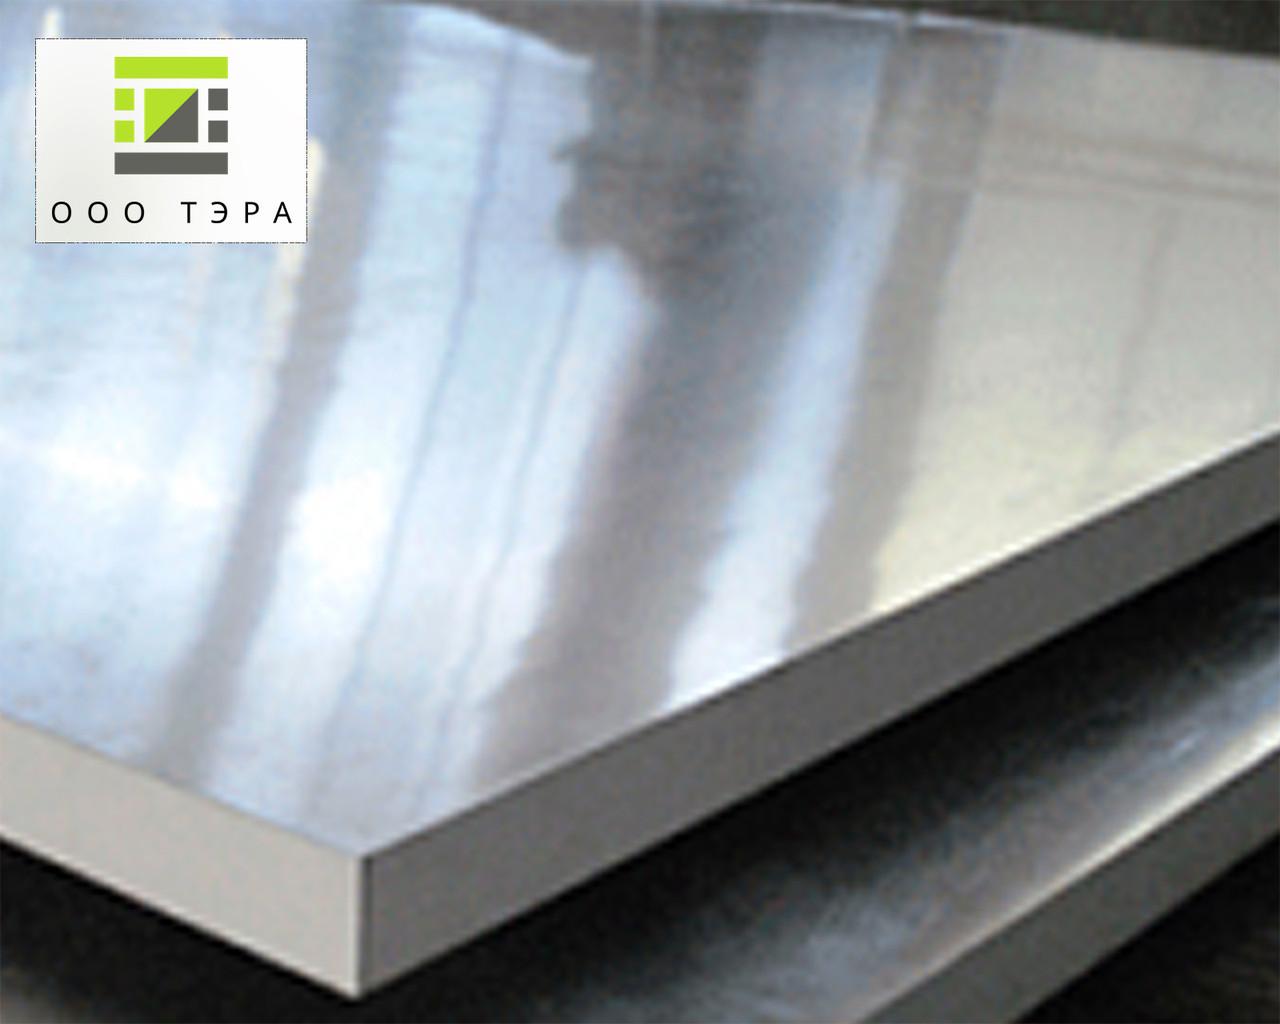 Плита алюминиевая 40 мм 7075 аналог В95 1520х3020 мм высокопрочный сплав